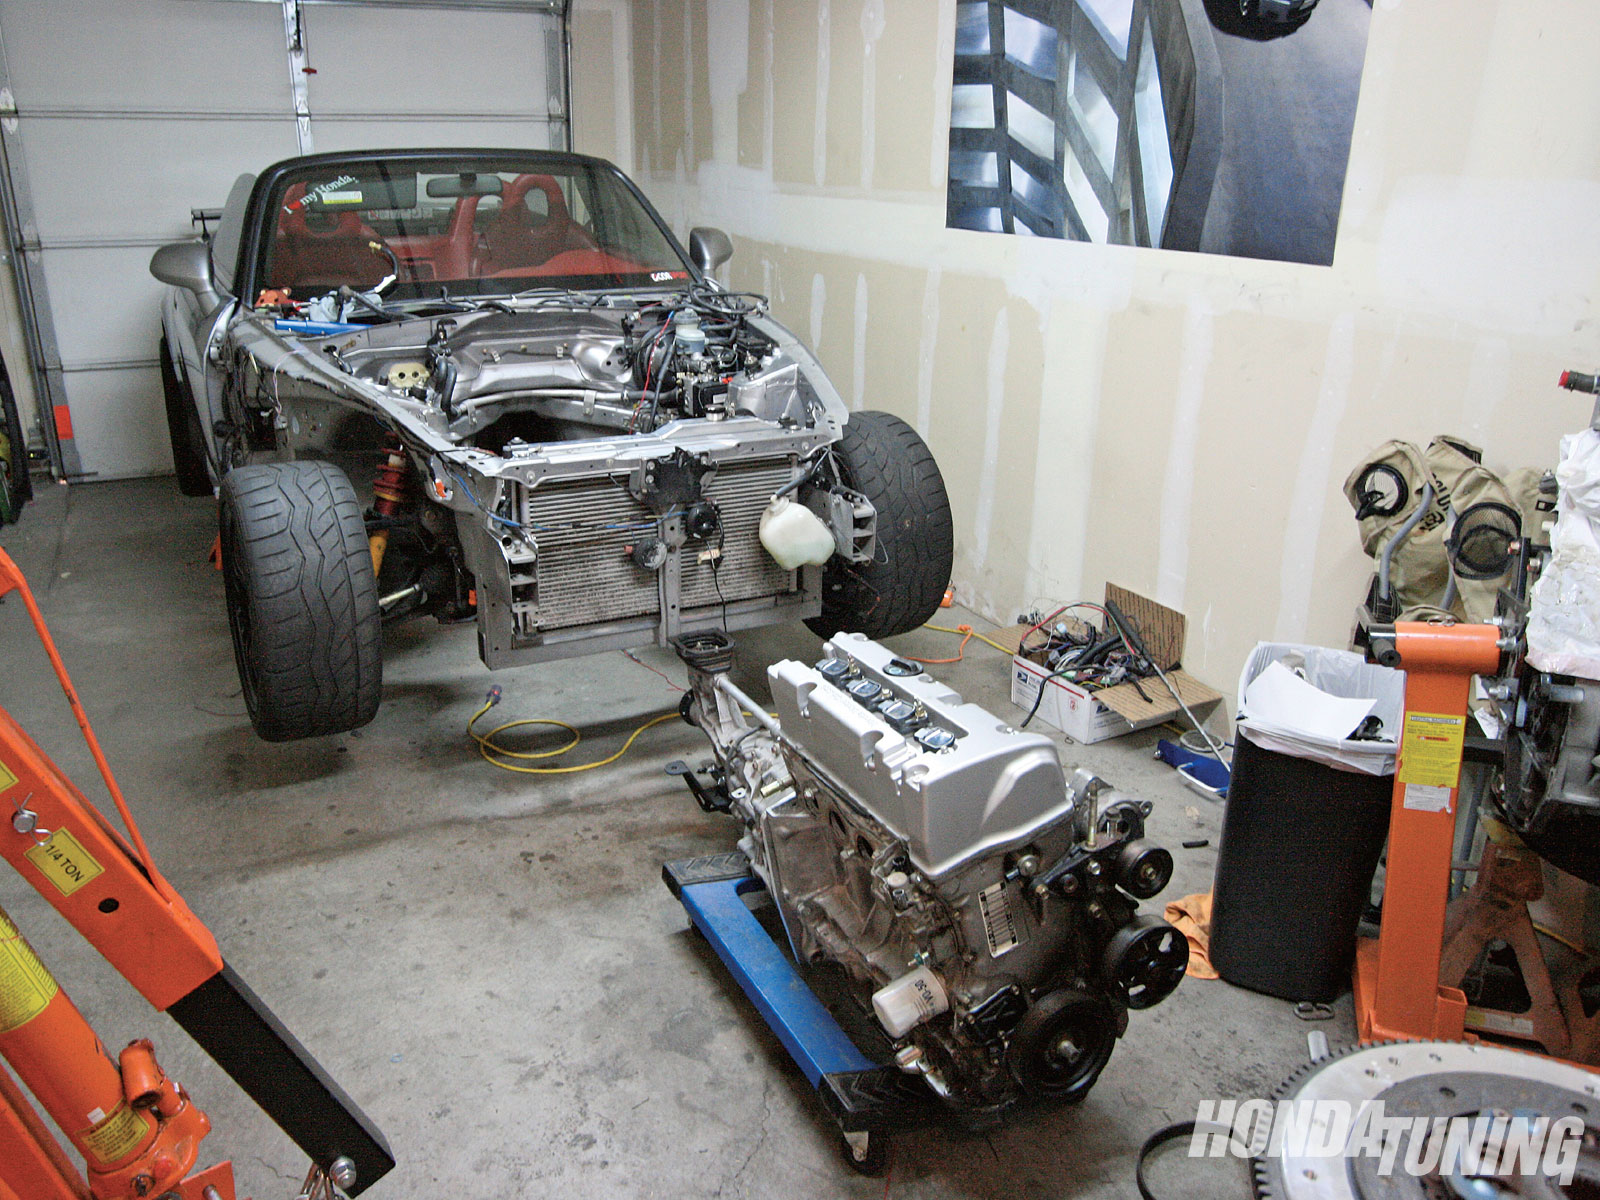 medium resolution of htup 1010 01 o k24 swap into s2000 chassis s2000 chassis htup 1010 k24 into s2000 chassis swap